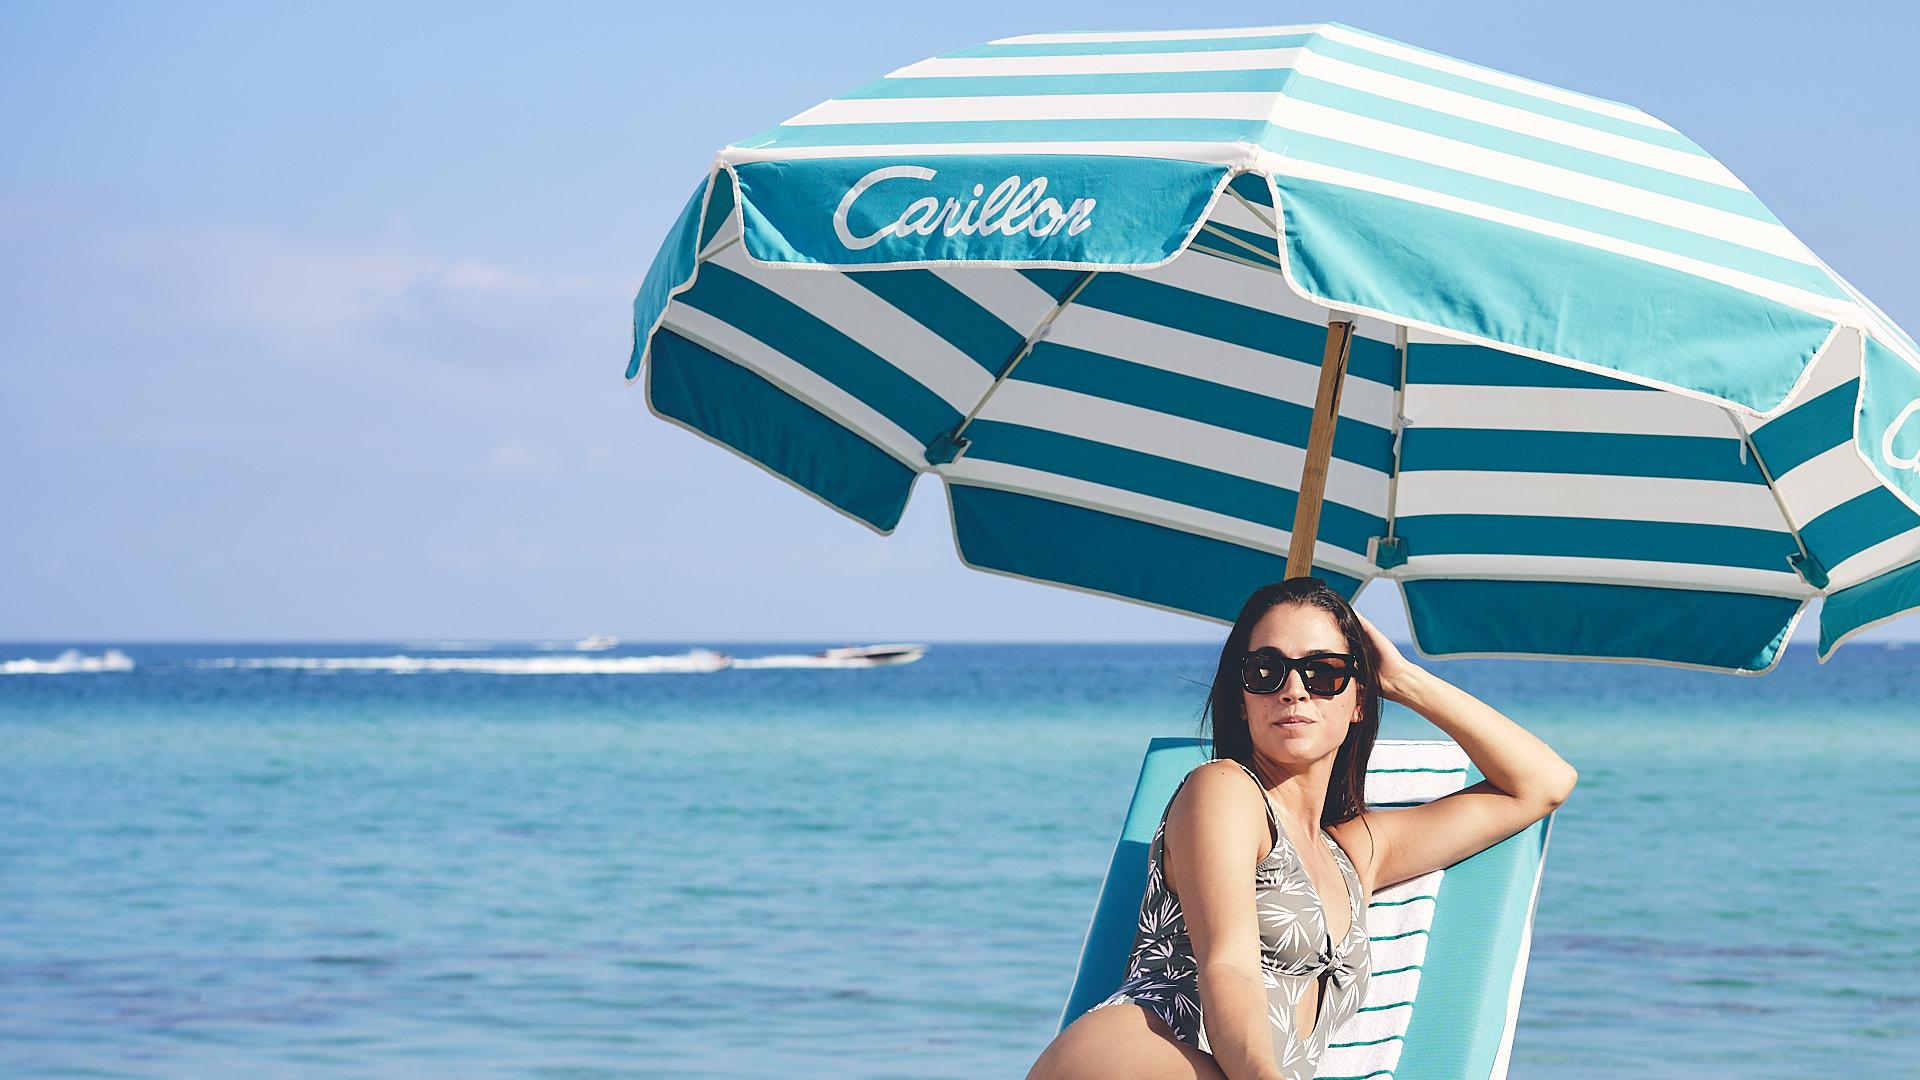 Carillon-lifestyle-BEACH-VIB-TONED-0837.jpg